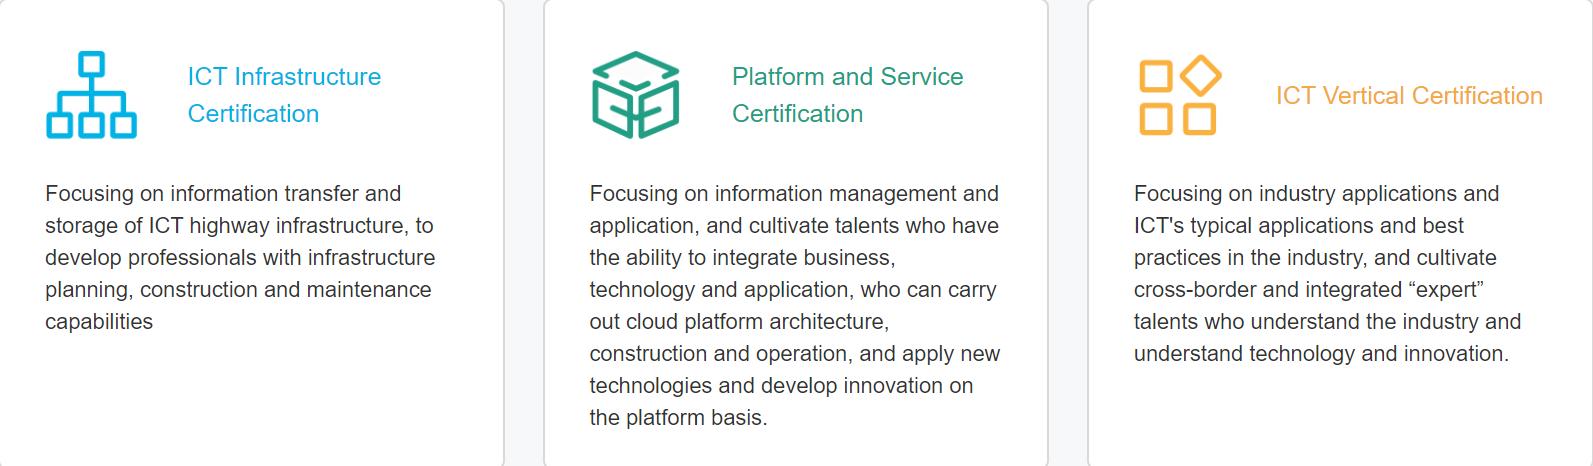 Huawei certification categories